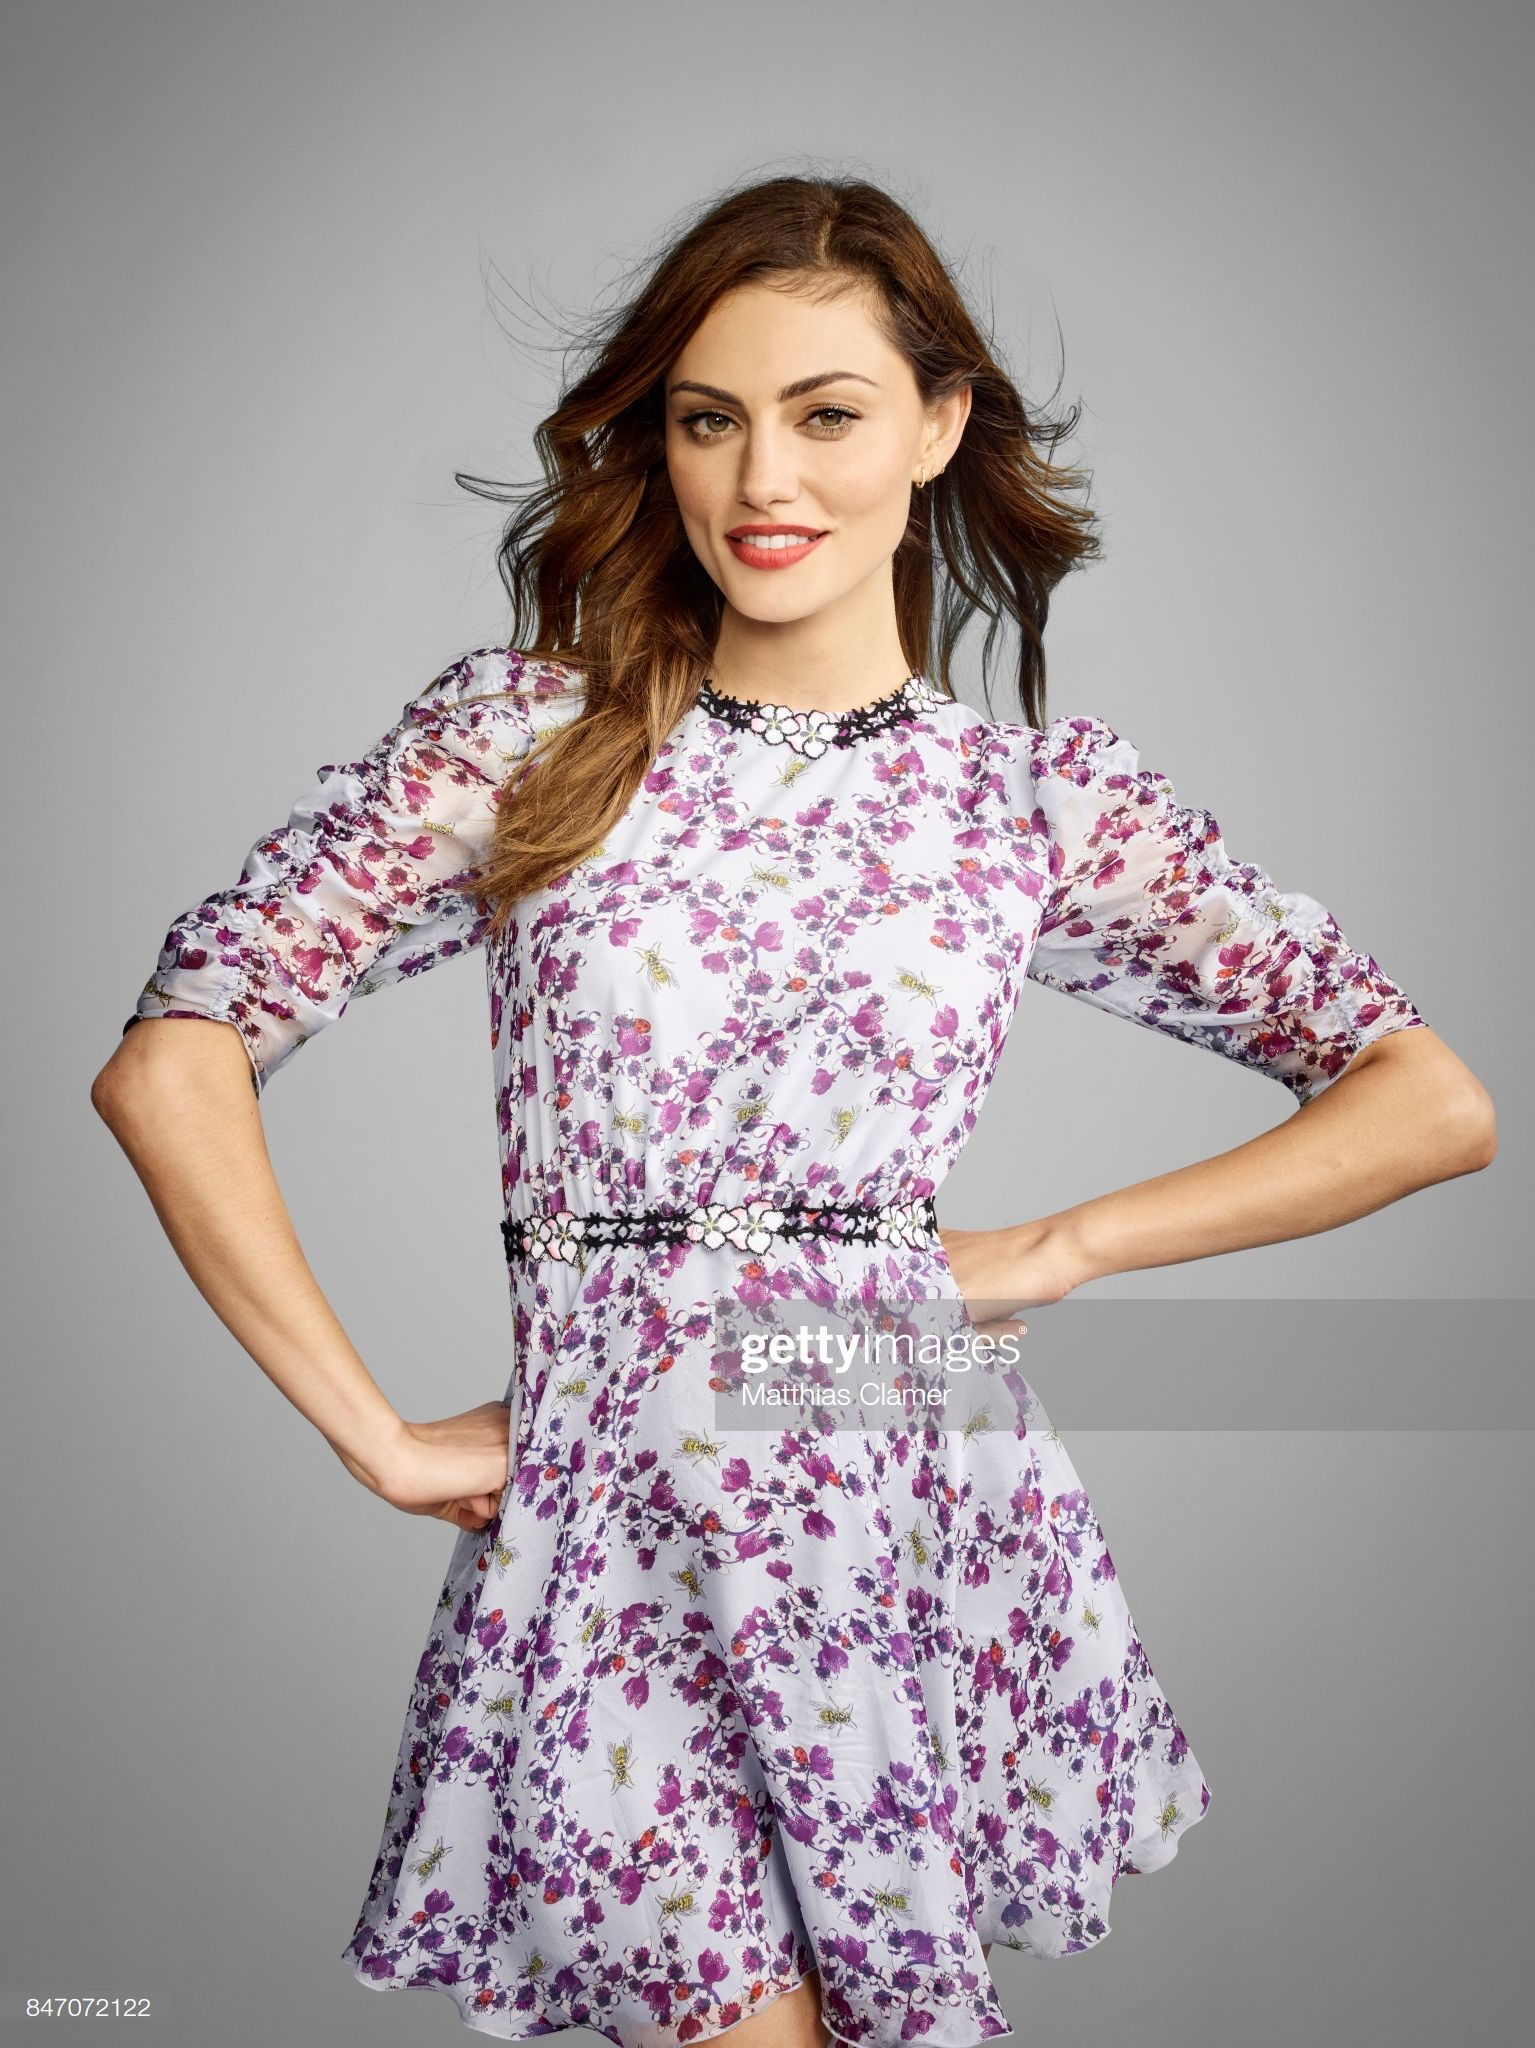 Phoebe Tonkin, Casual Dress, Fashion